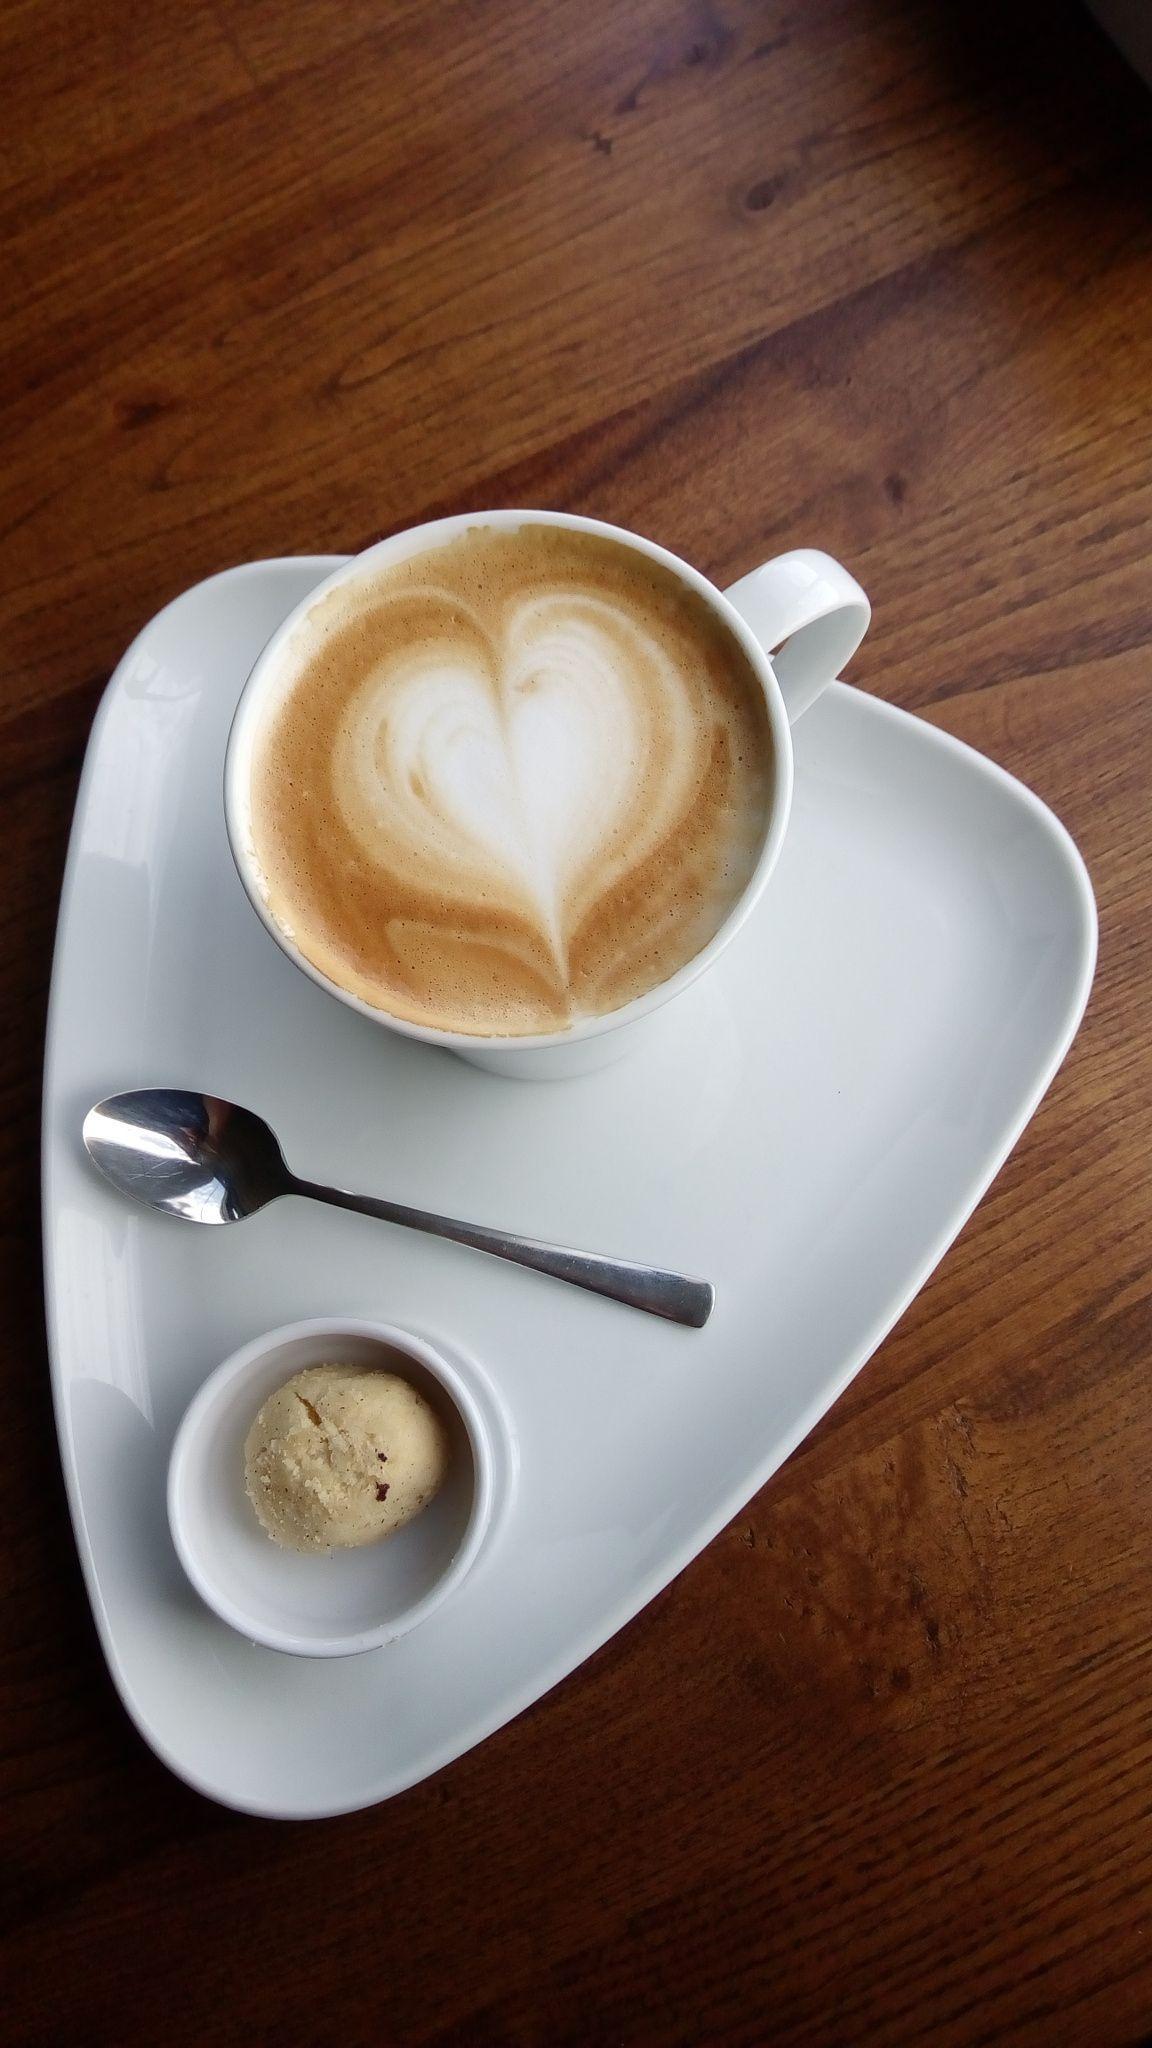 Pin By Jaroslava Kovářová On Espresso Yourself Good Morning Coffee My Coffee Shop Coffee Heart